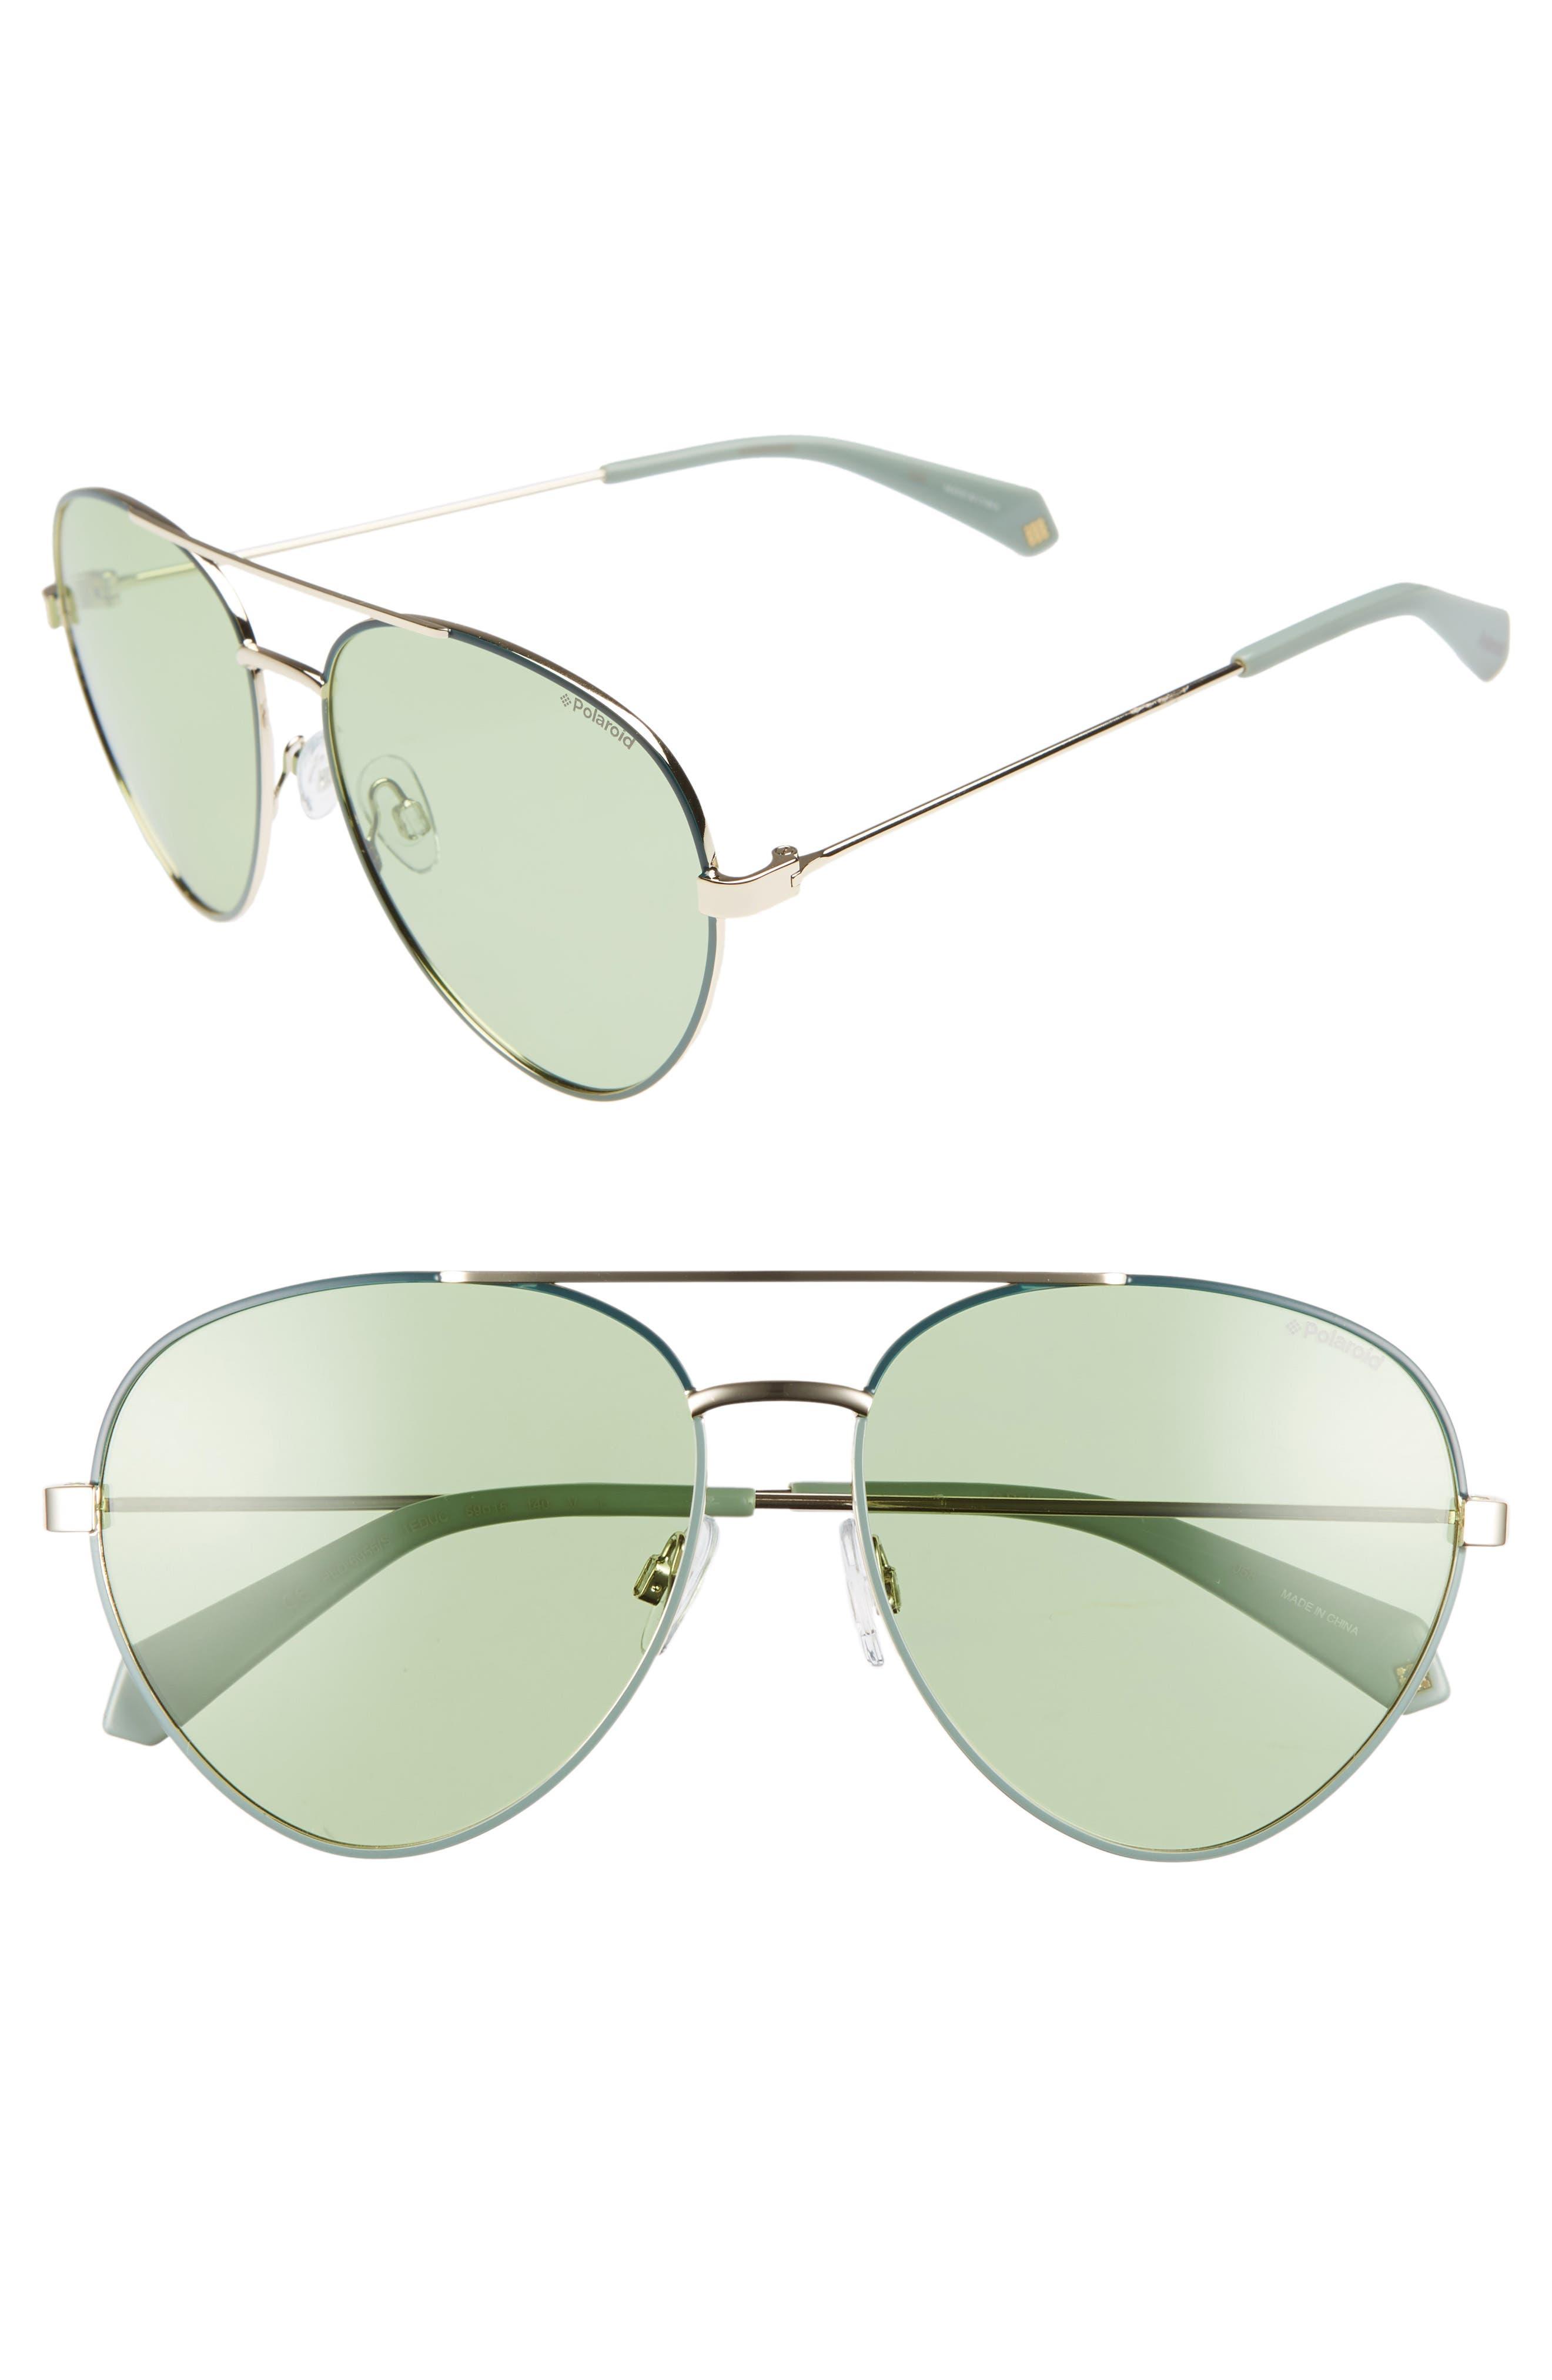 Polaroid 5m Polarized Aviator Sunglasses - Green